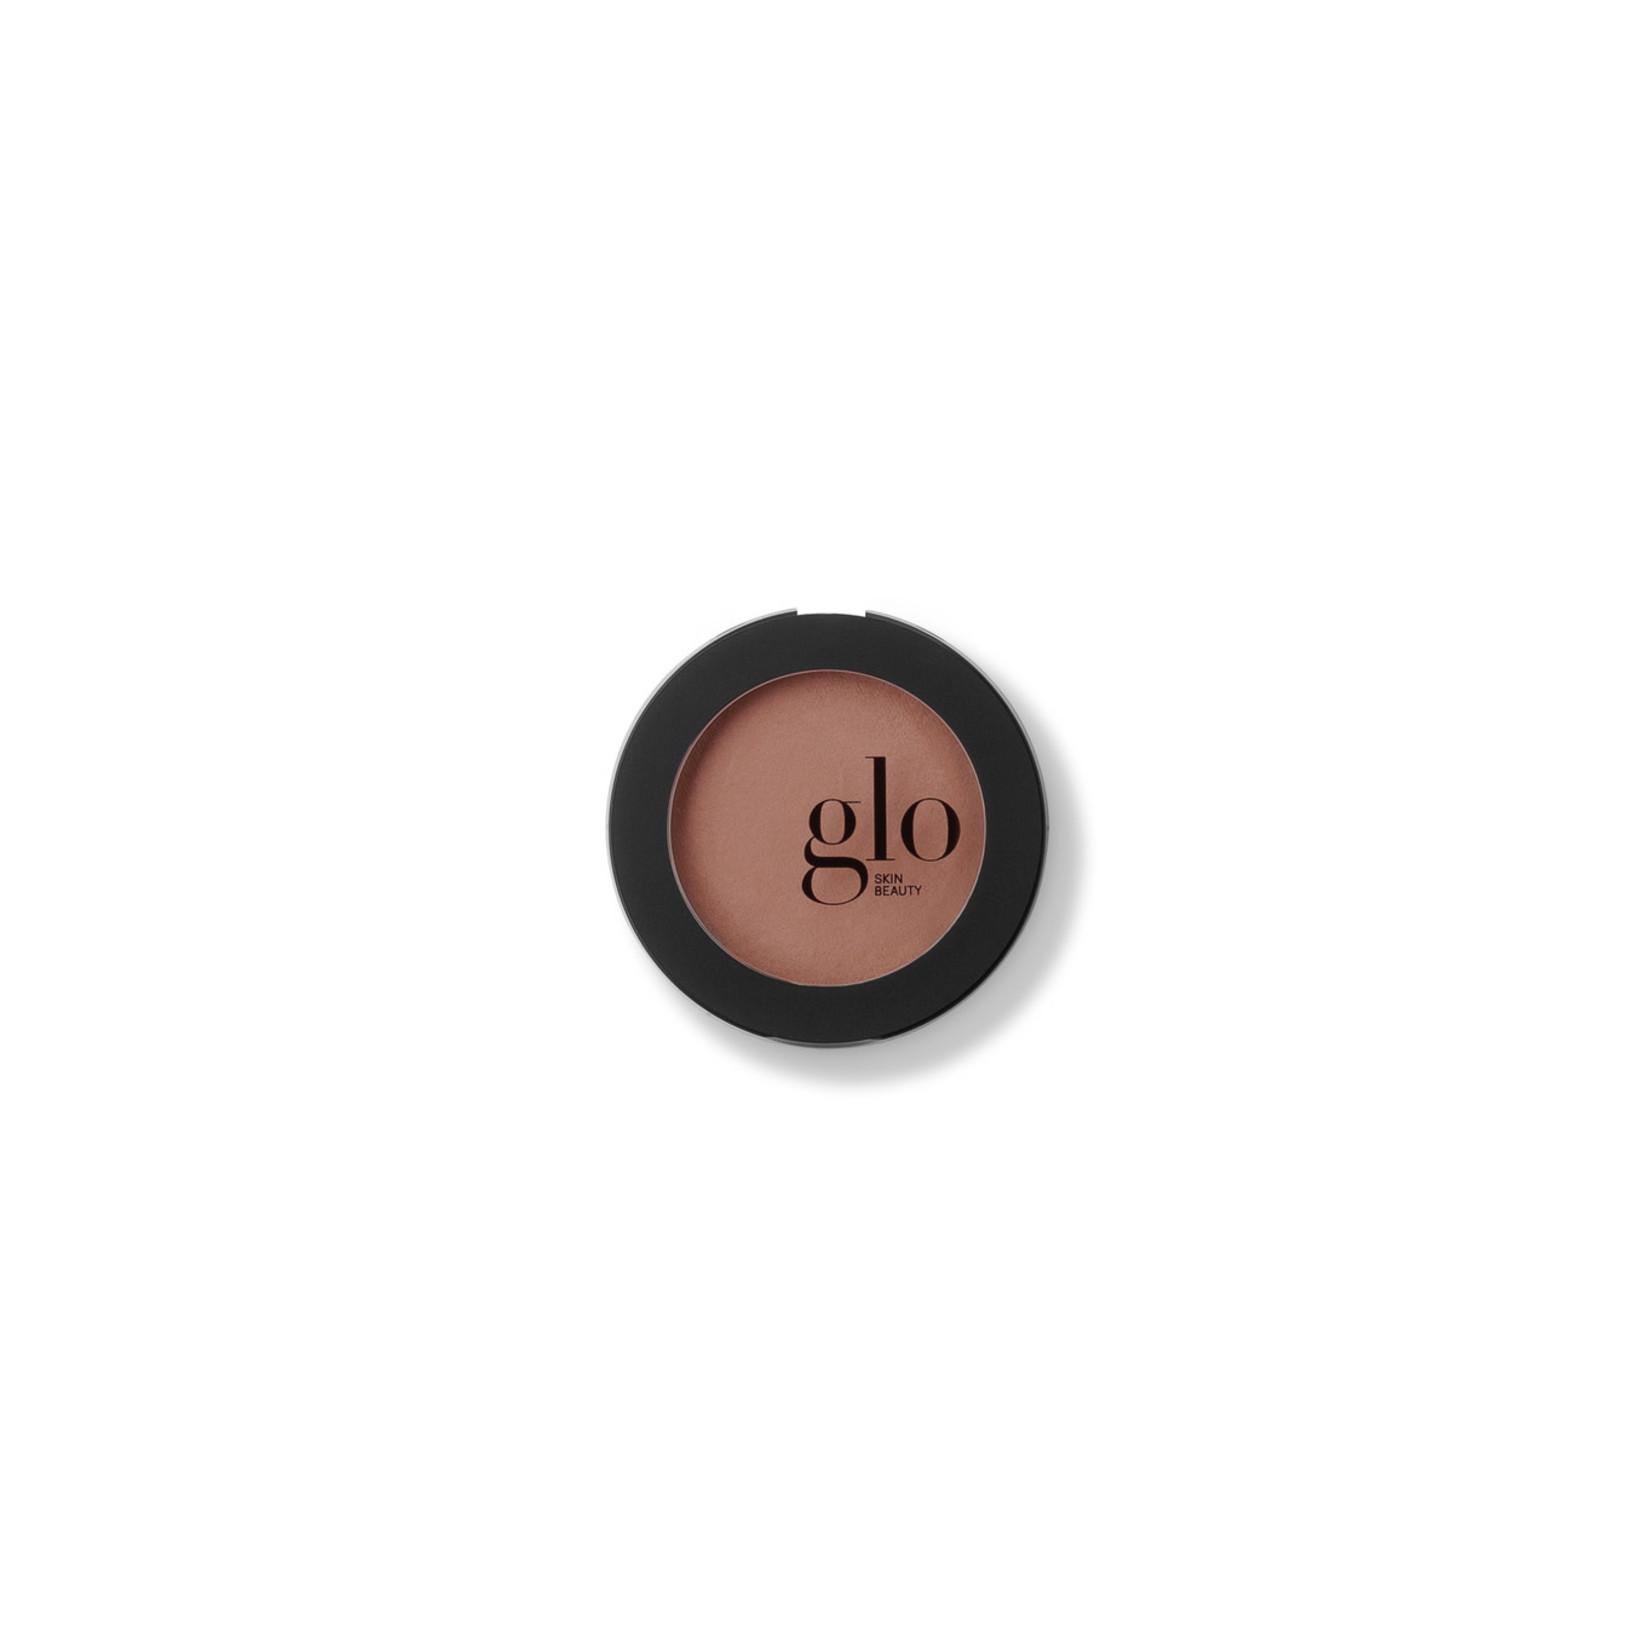 Glo Skin Beauty Blush